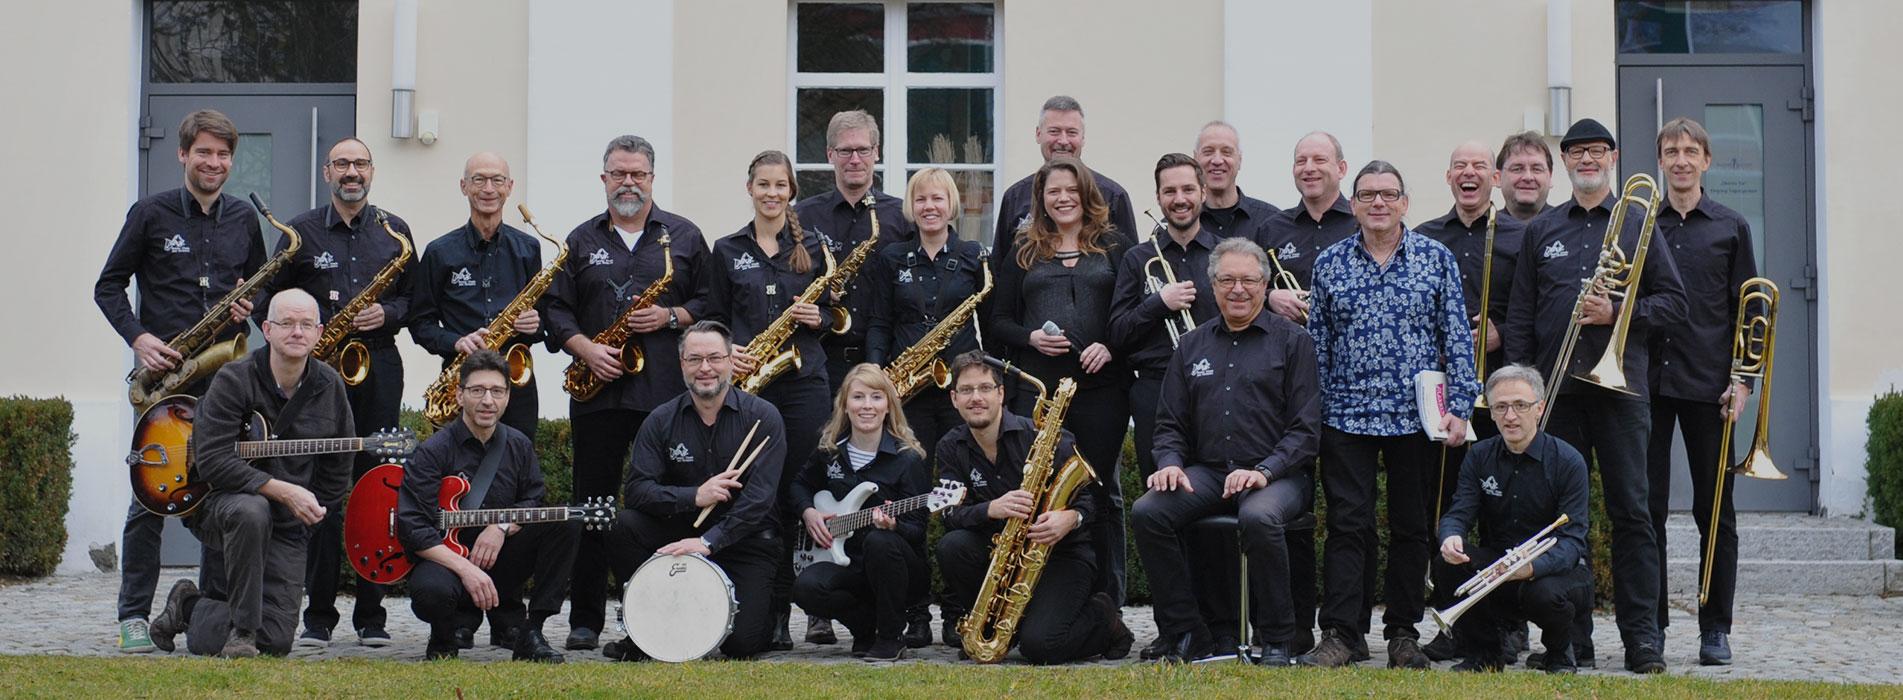 Daimler Classic Jazz Orchester